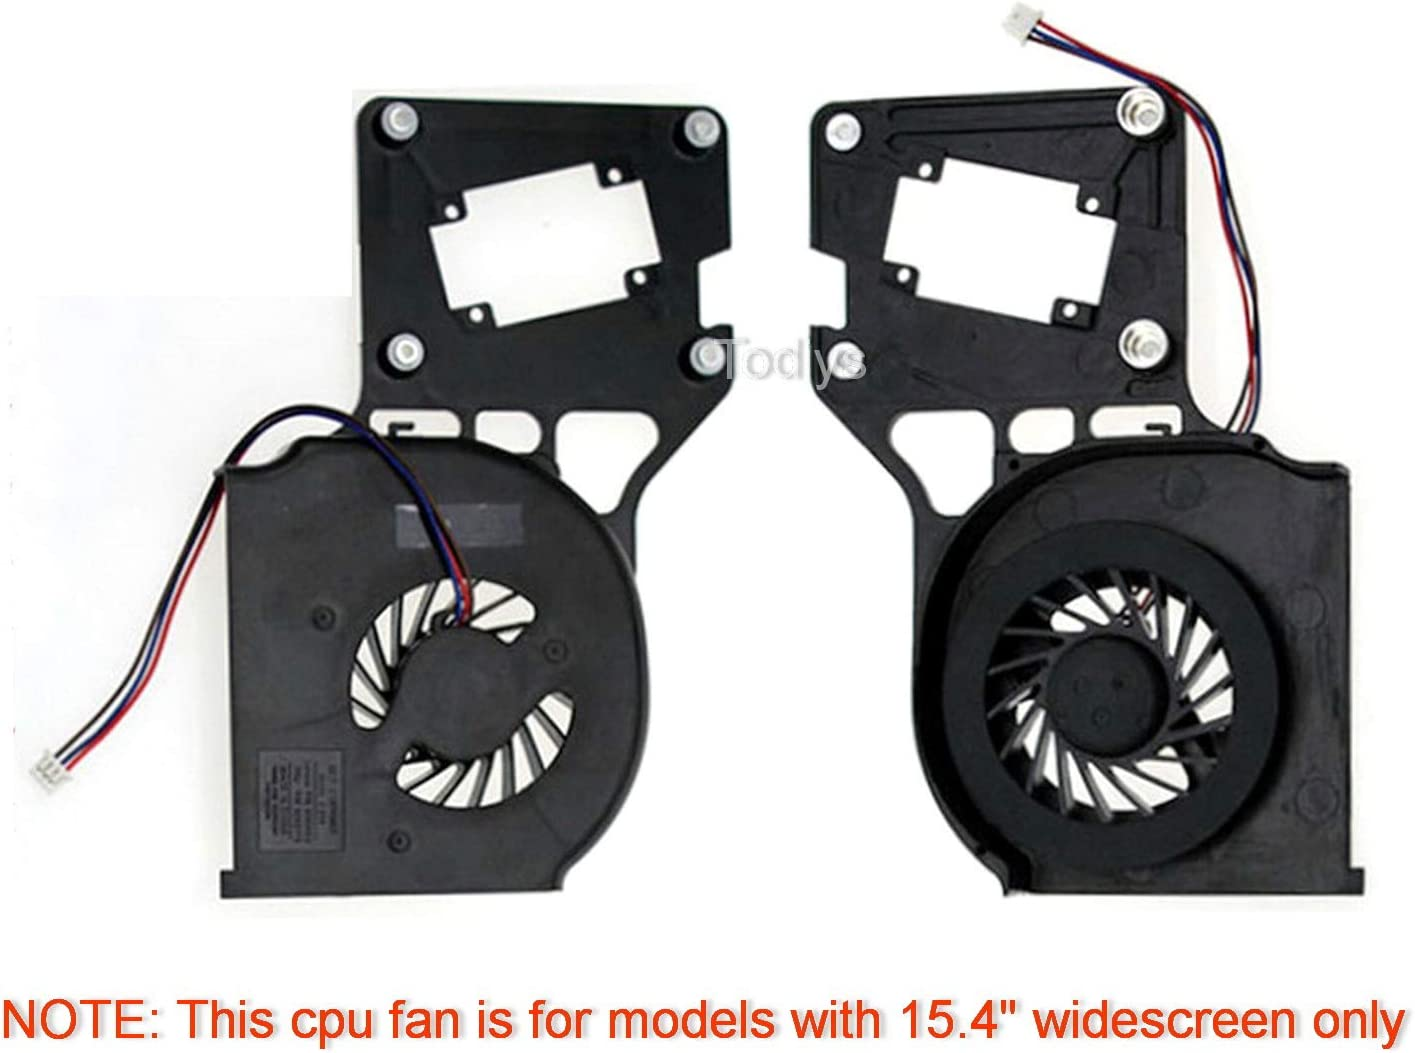 CPU Cooling Fan For IBM Thinkpad Lenovo R61 R61E MCF-219PAM05 42W2779 42W2780 US